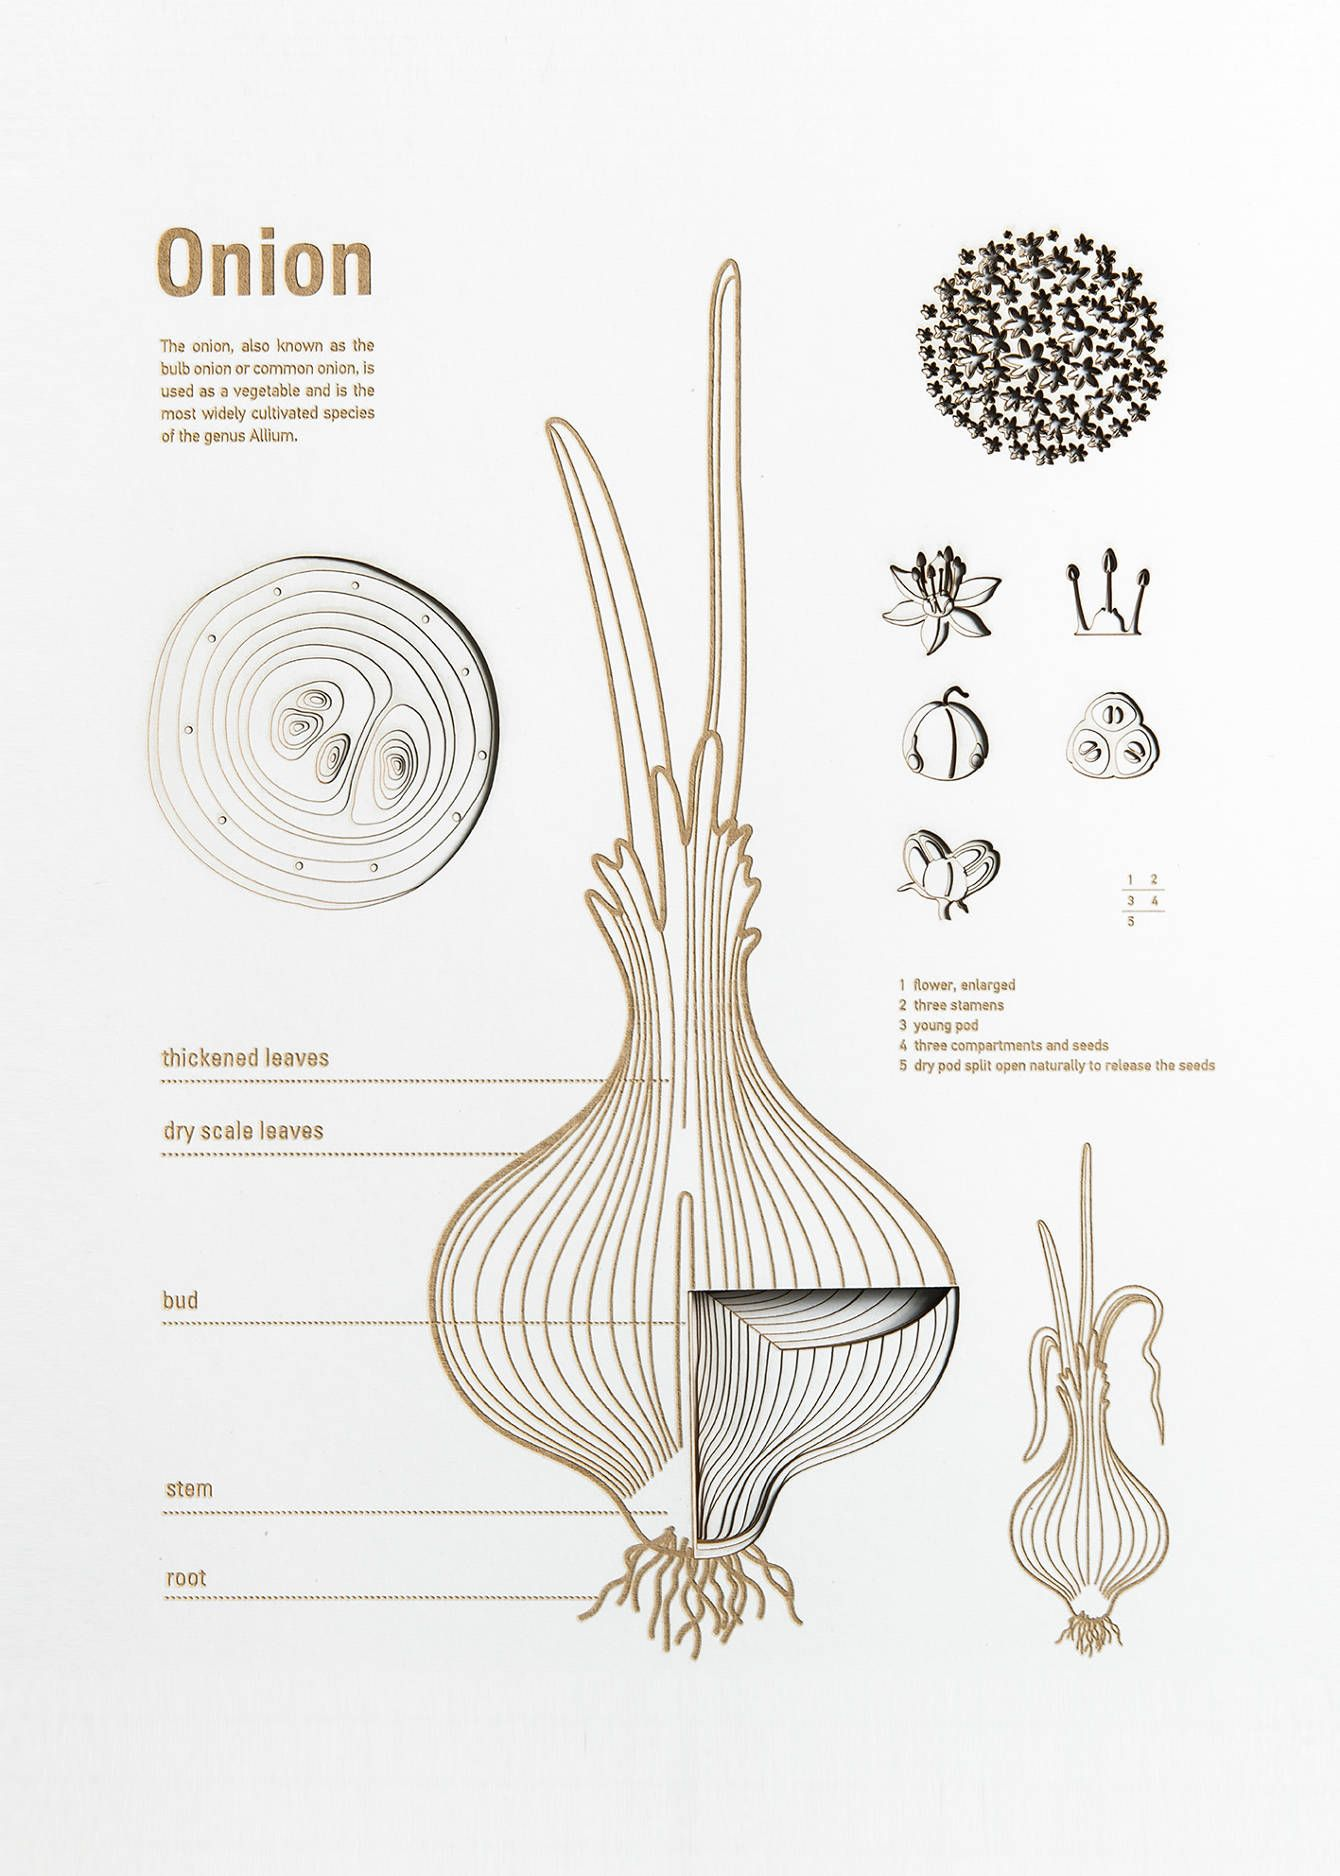 Vegetable Anatomy Posters - HONG WEI | Fruit & Veg Ref | Pinterest ...